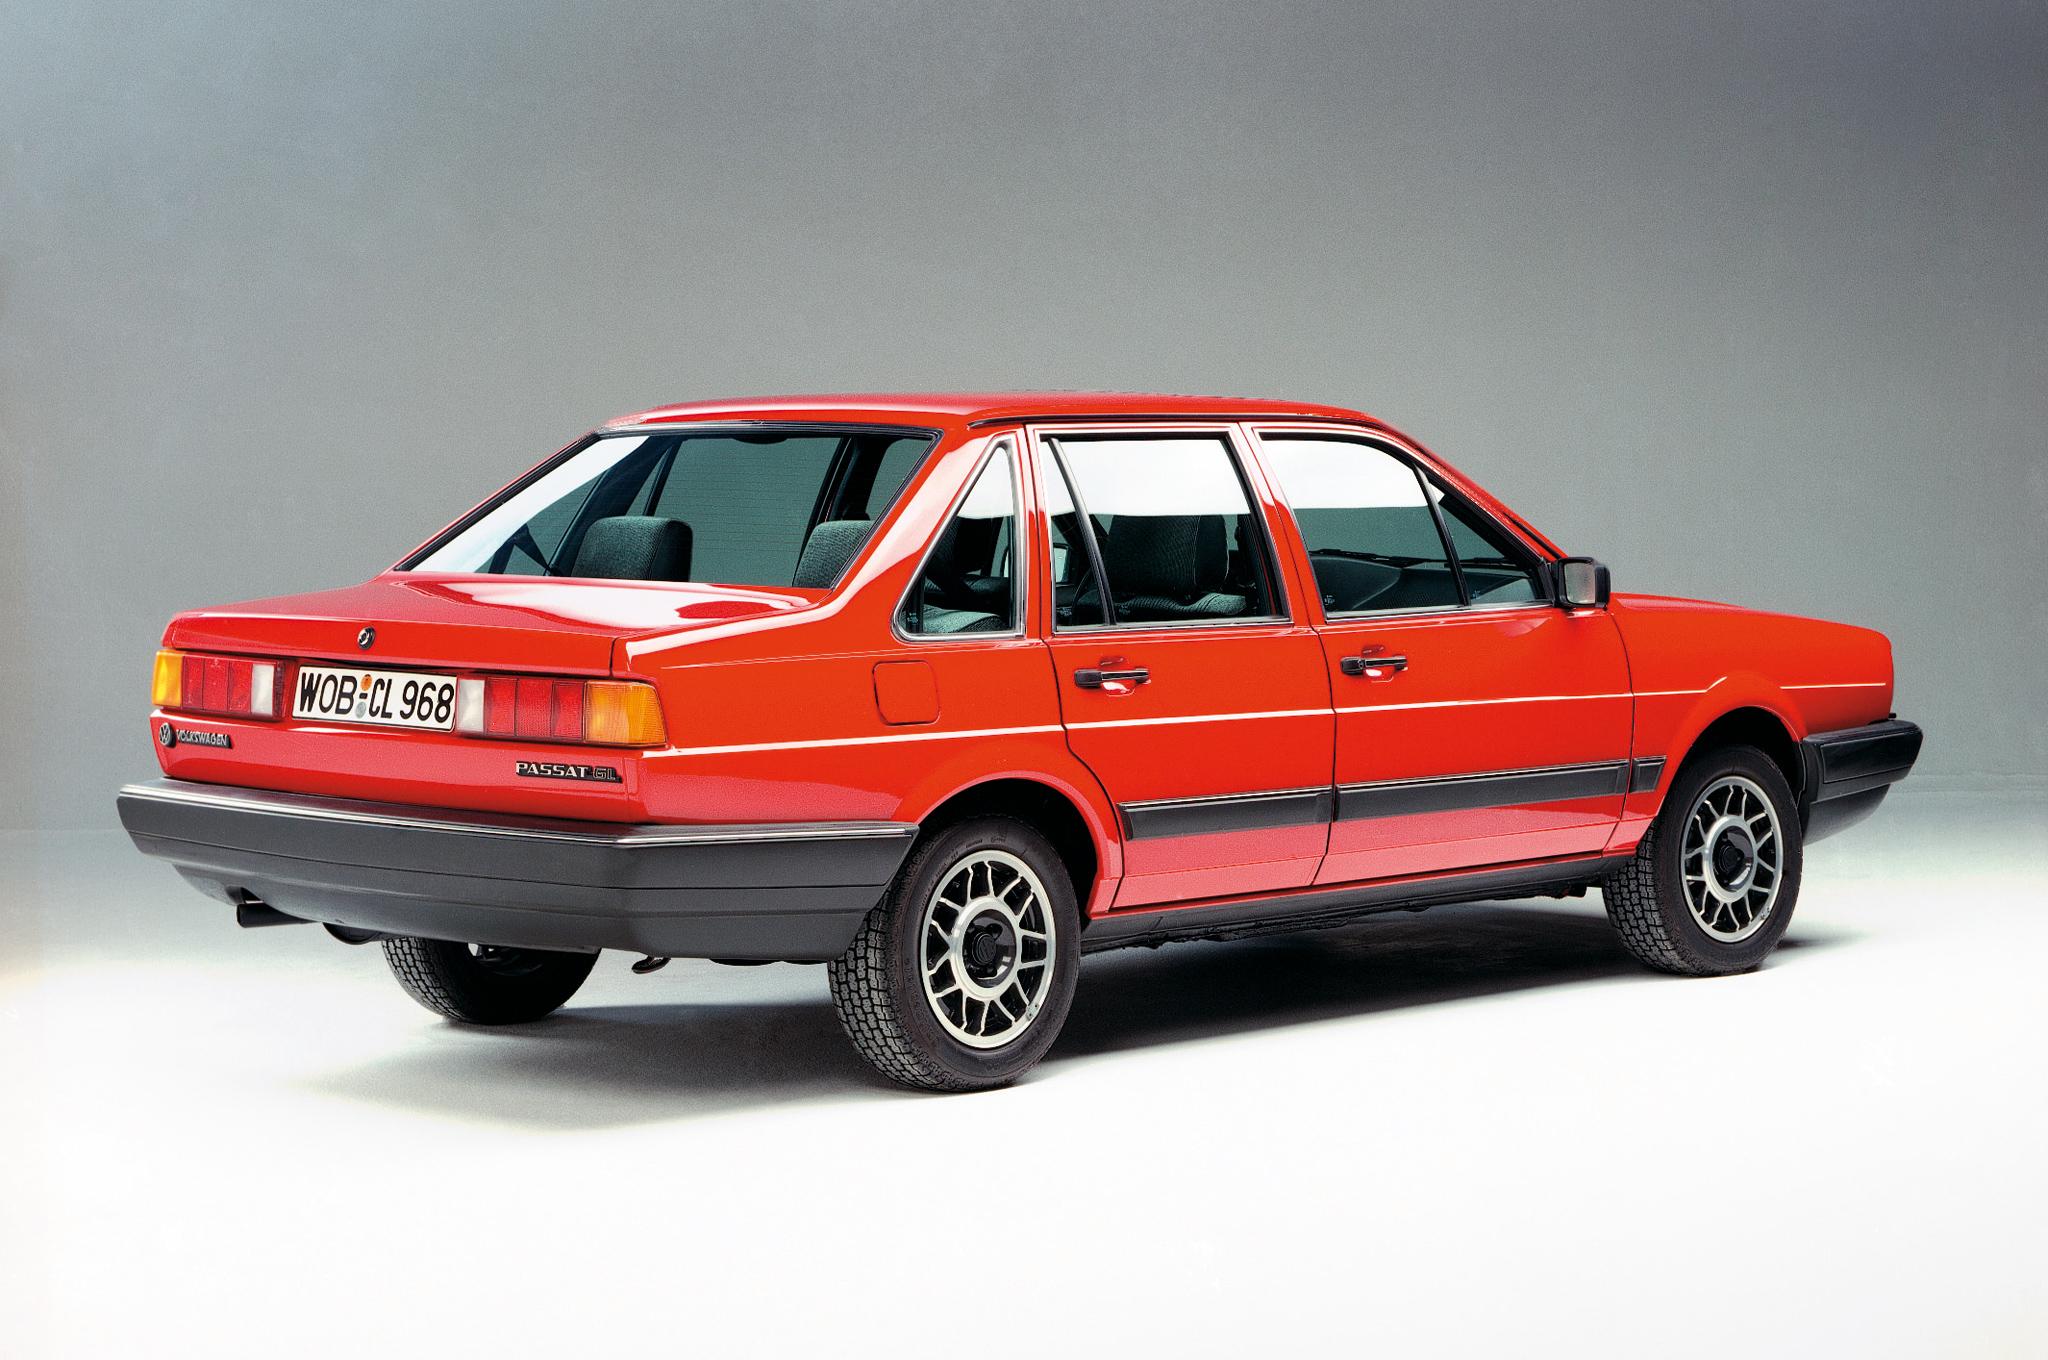 VW PASSAT седан (32)